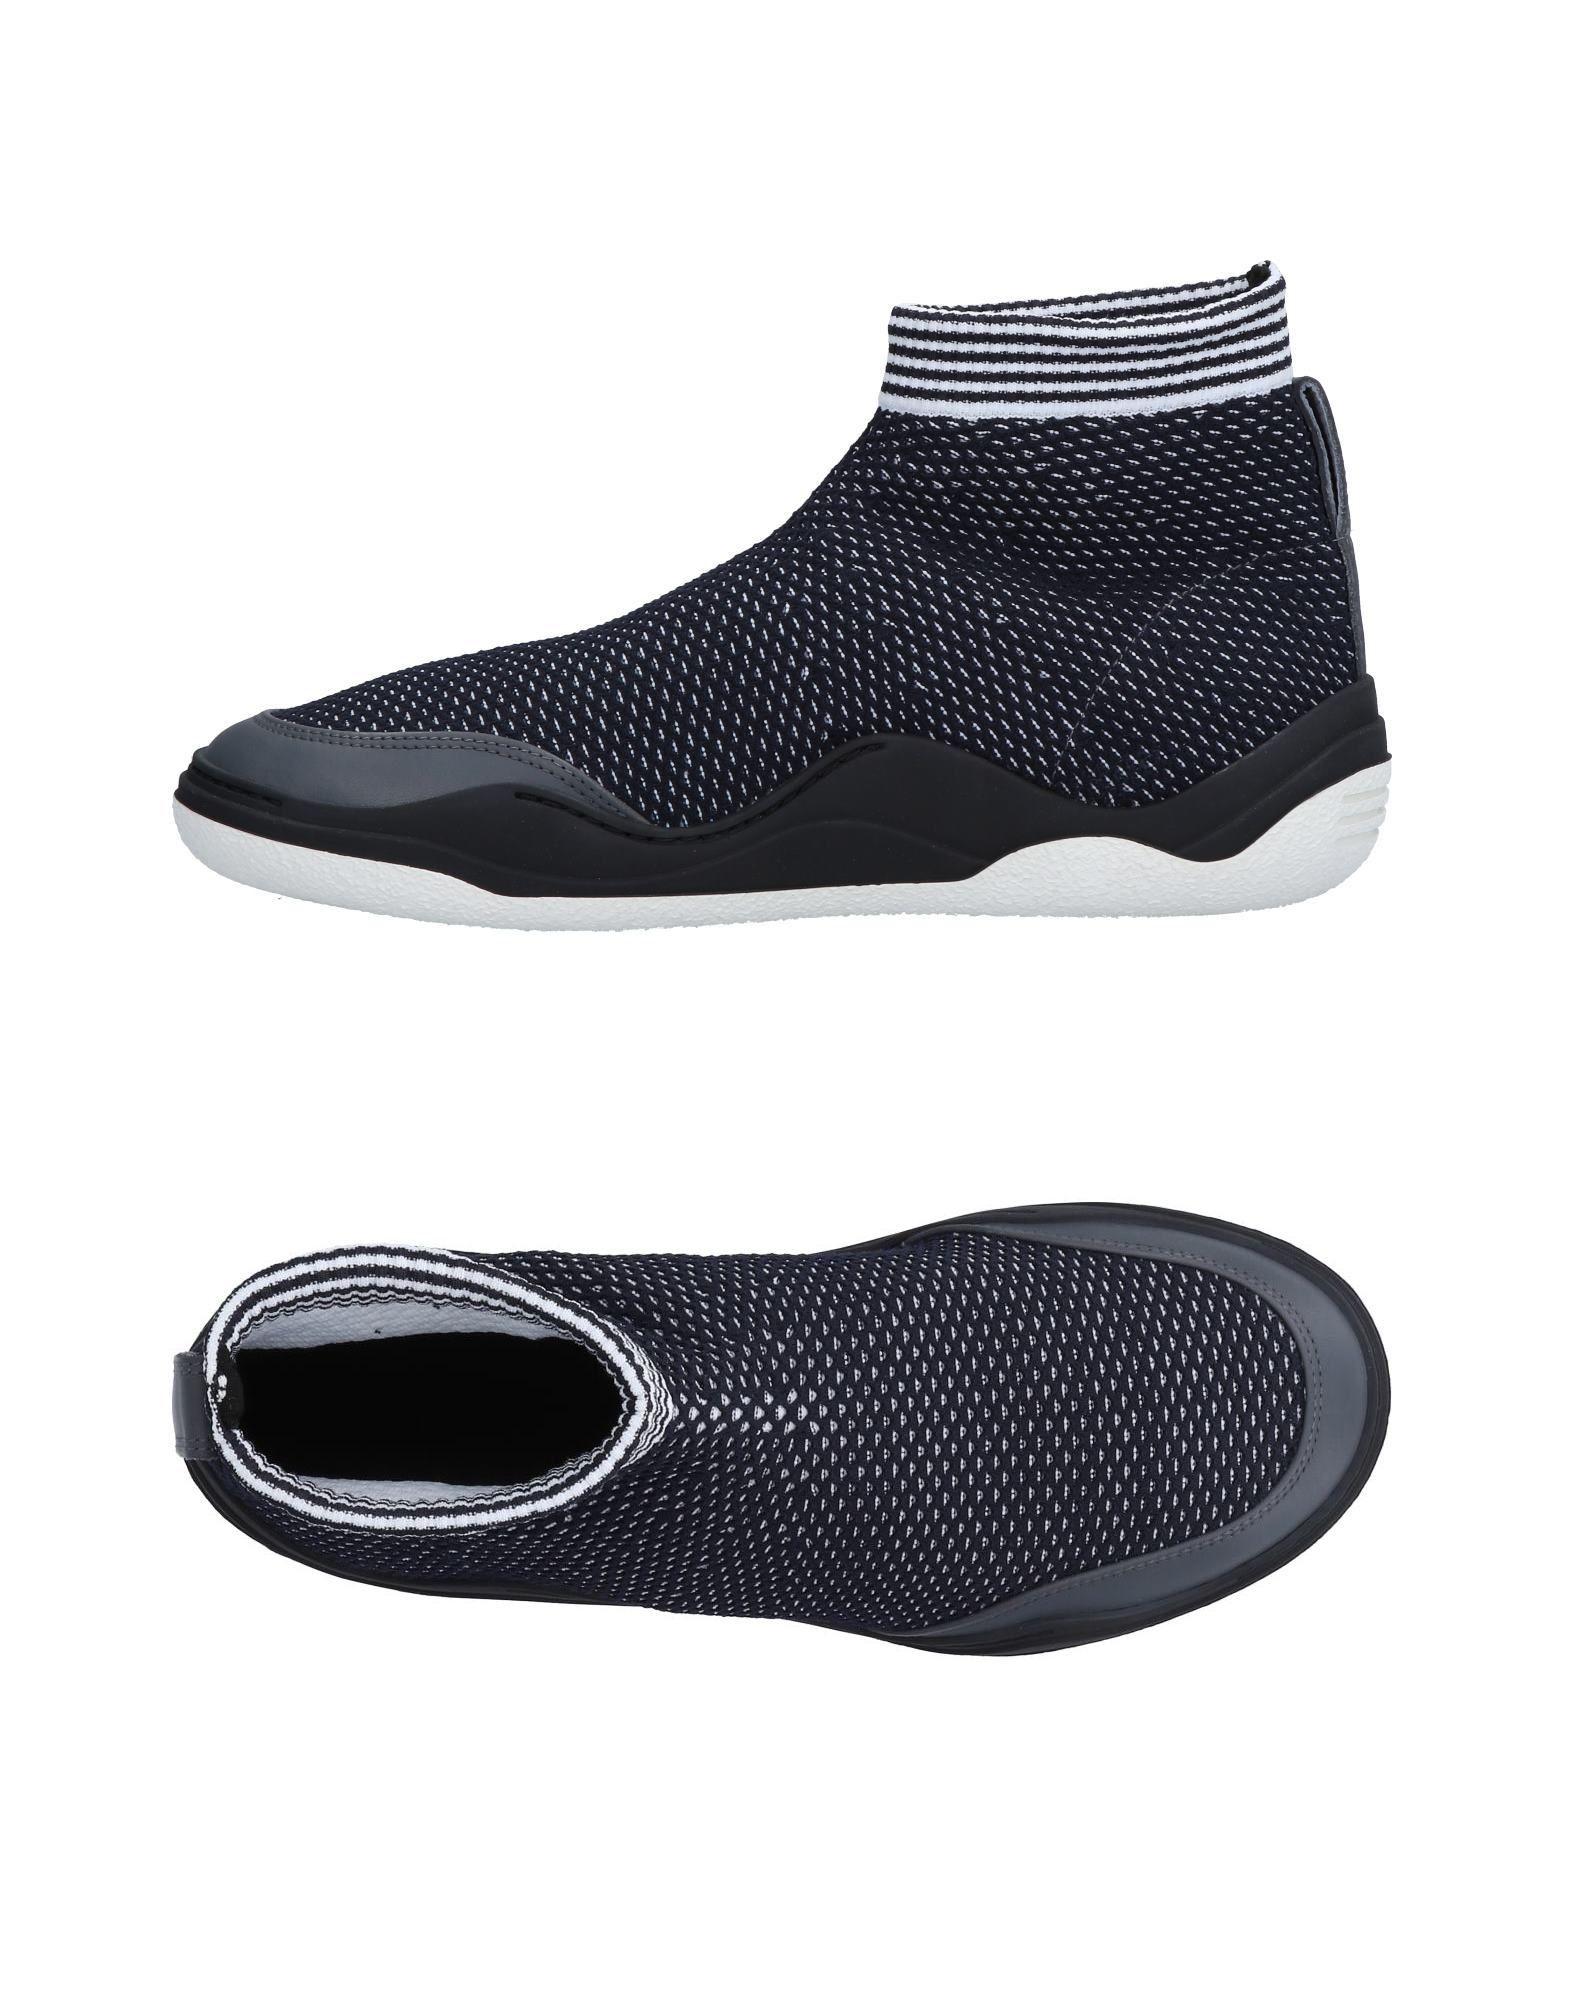 Lanvin Sneakers Herren  11505146HD Gute Qualität beliebte Schuhe